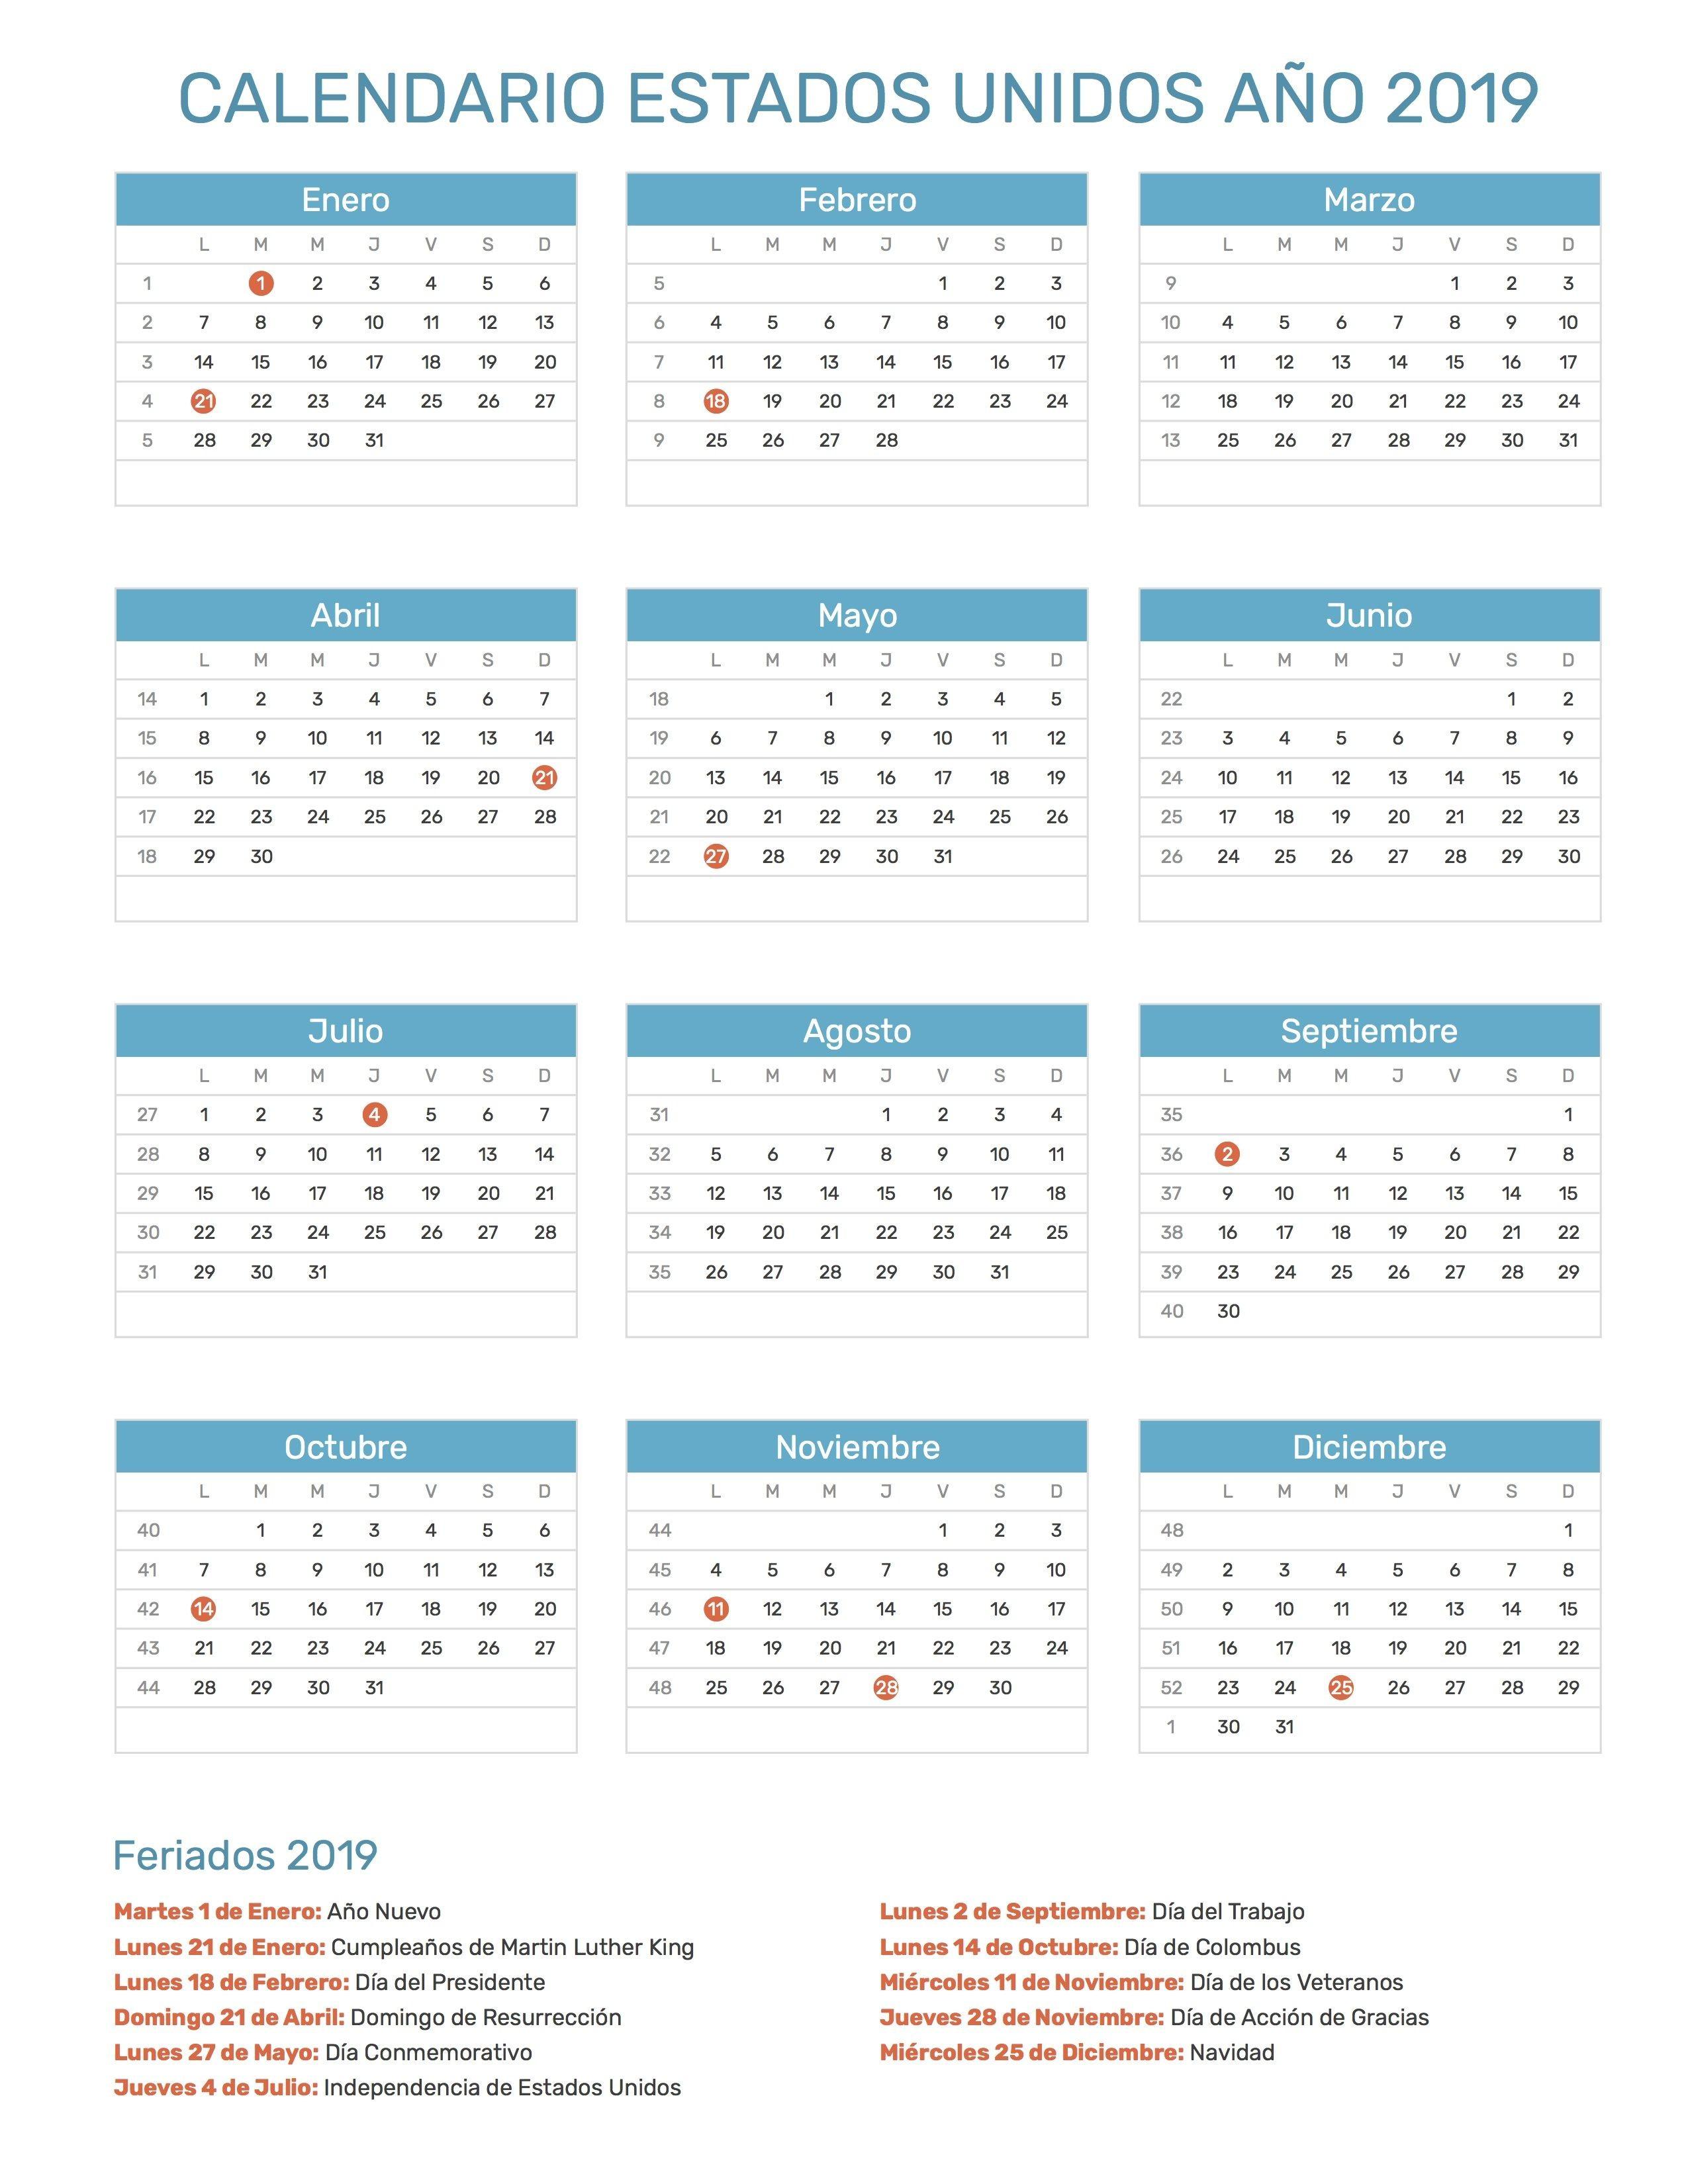 Calendario Laboral 2019 Aragon Más Recientemente Liberado Pin De Calendario Hispano En Calendario Con Feriados A±o 2019 Of Calendario Laboral 2019 Aragon Más Caliente Boe Documento Consolidado Boe A 2018 9268